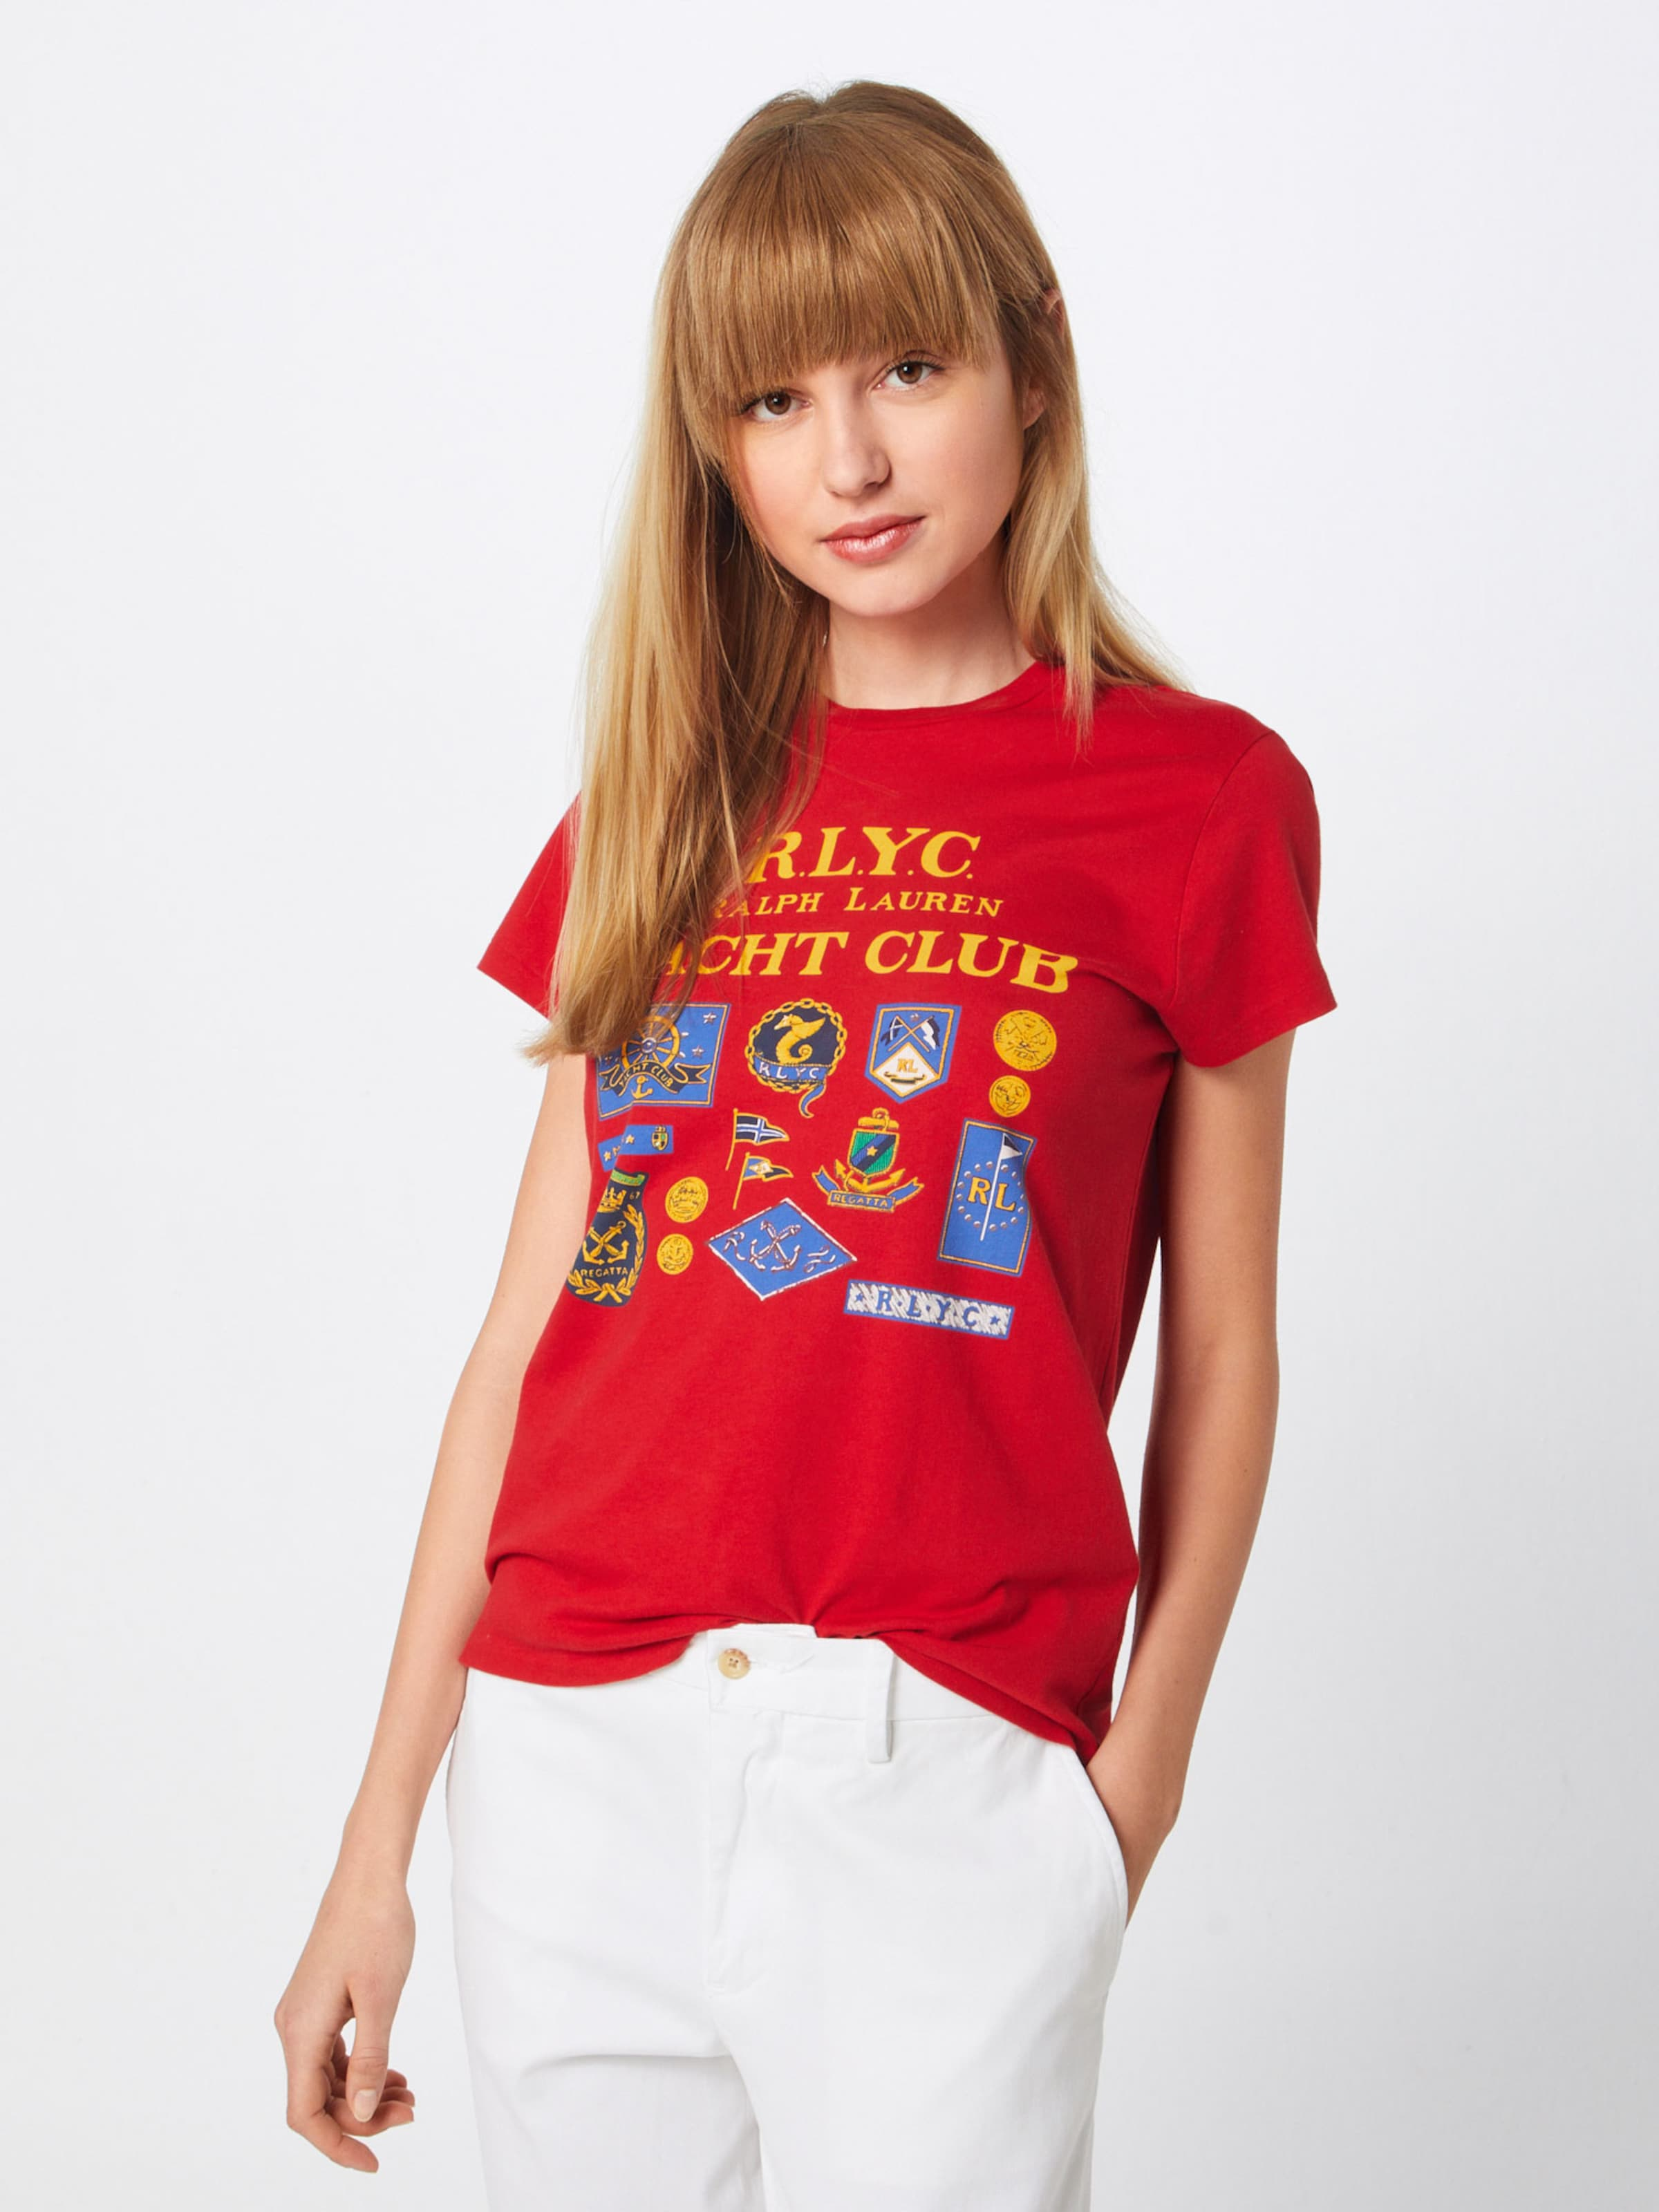 short shirt 'rlyc BleuJaune Lauren Polo En Rl T Tee knit' D'or Ralph Rouge Sleeve 0vwy8OmNn